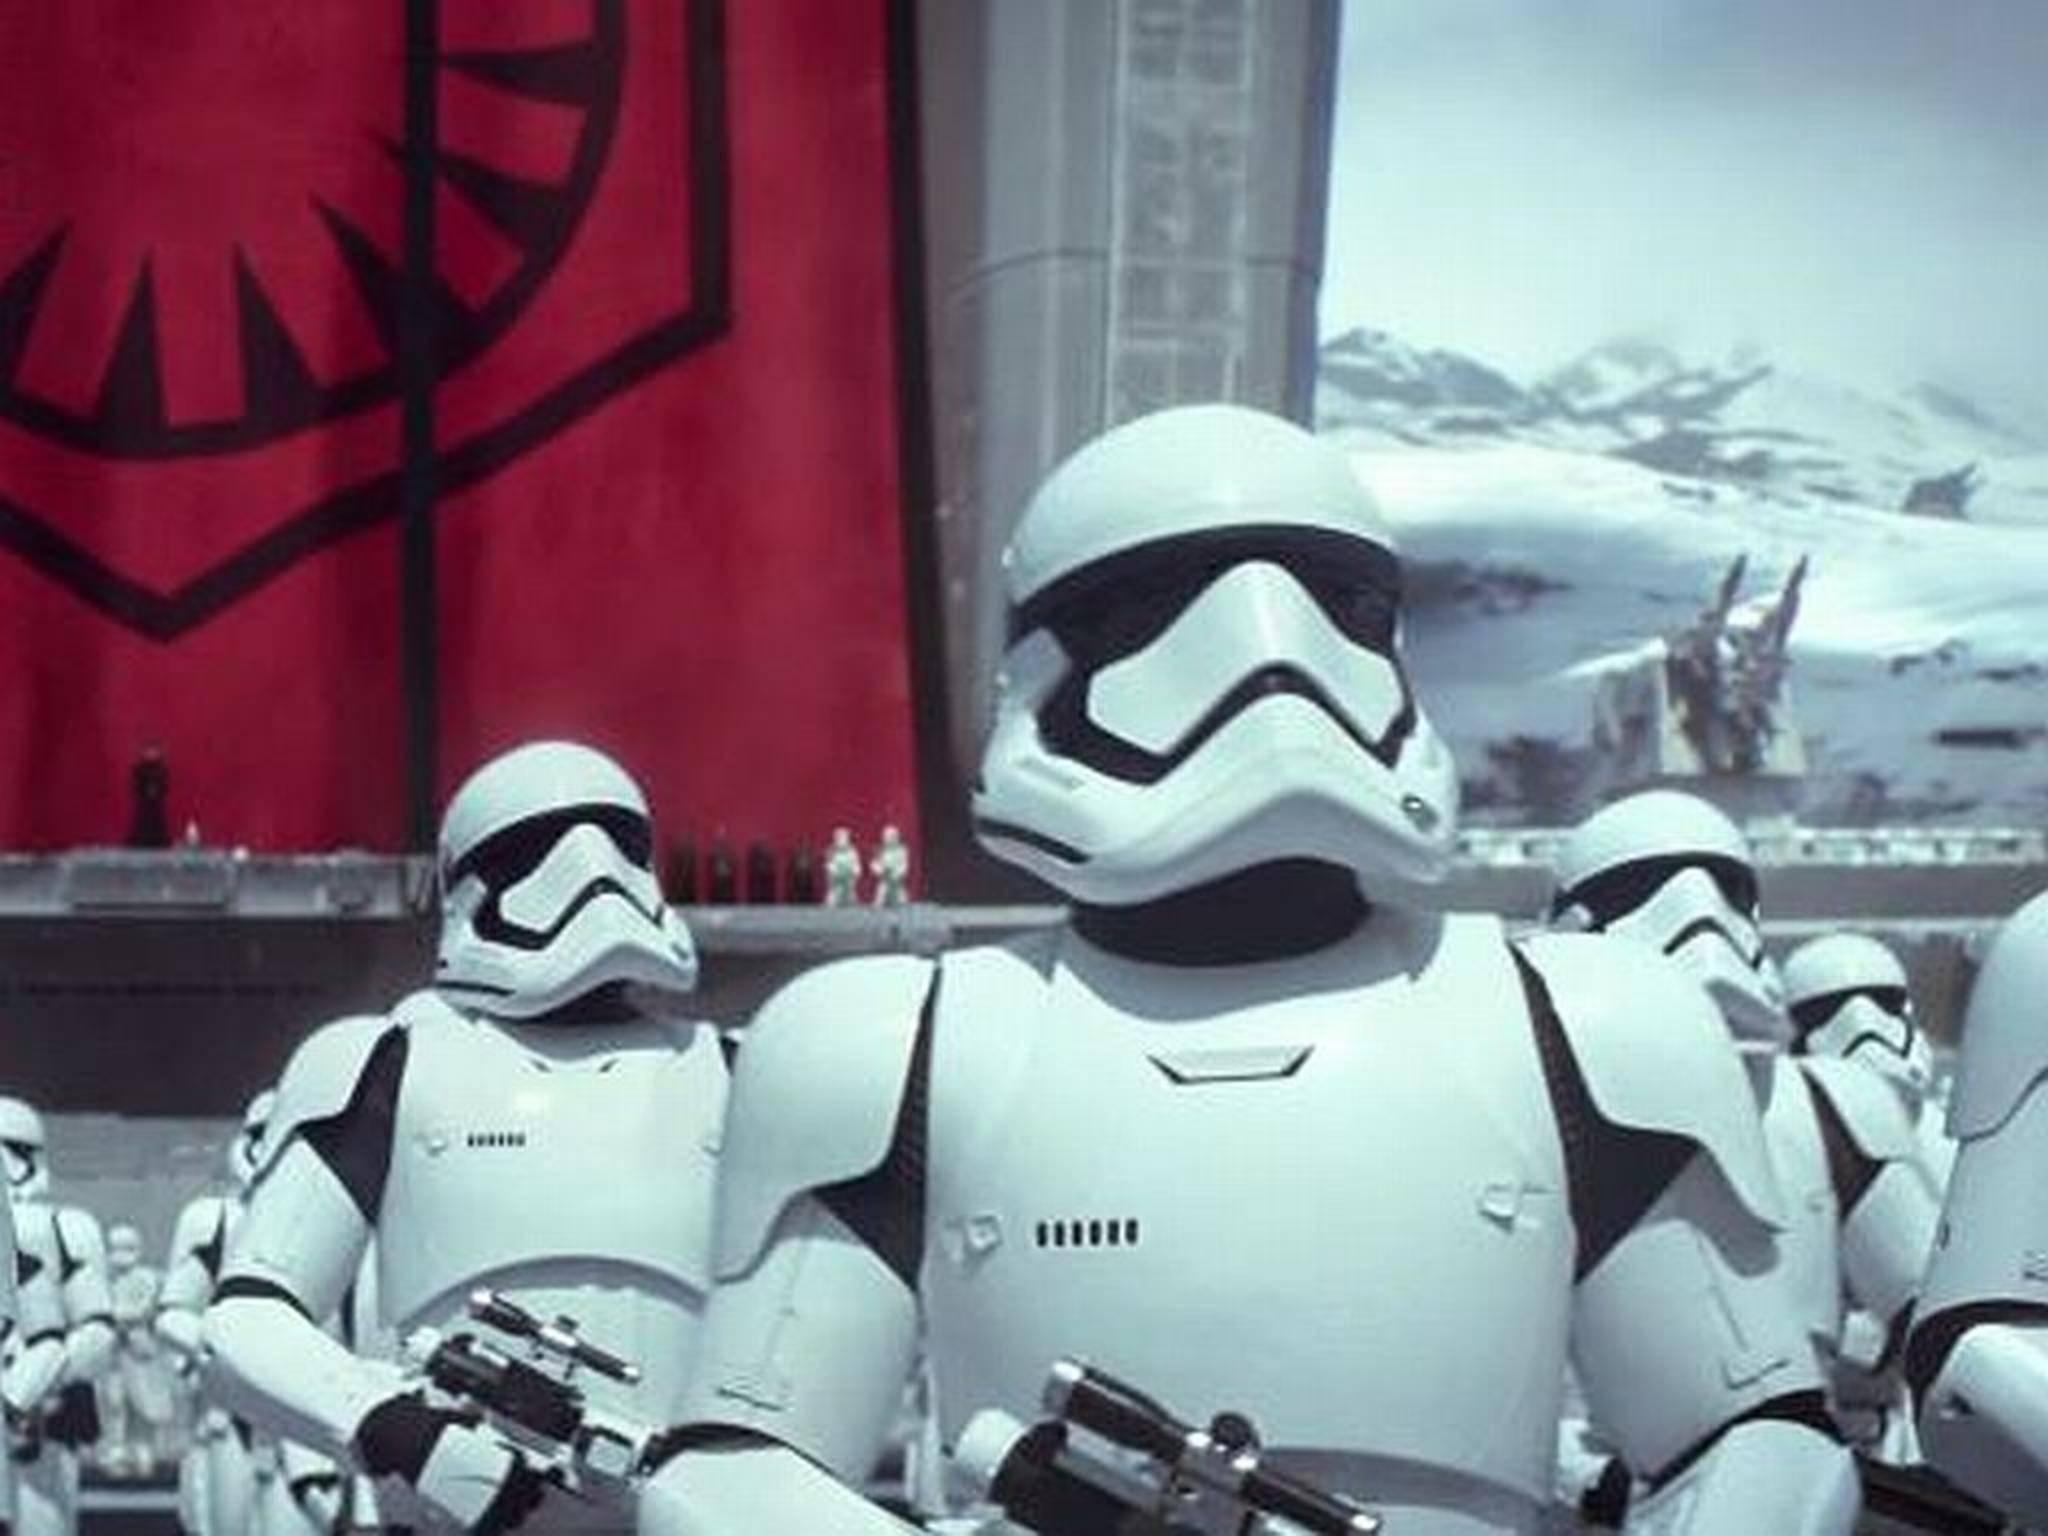 Stormtrooper_YouTube_Star Wars